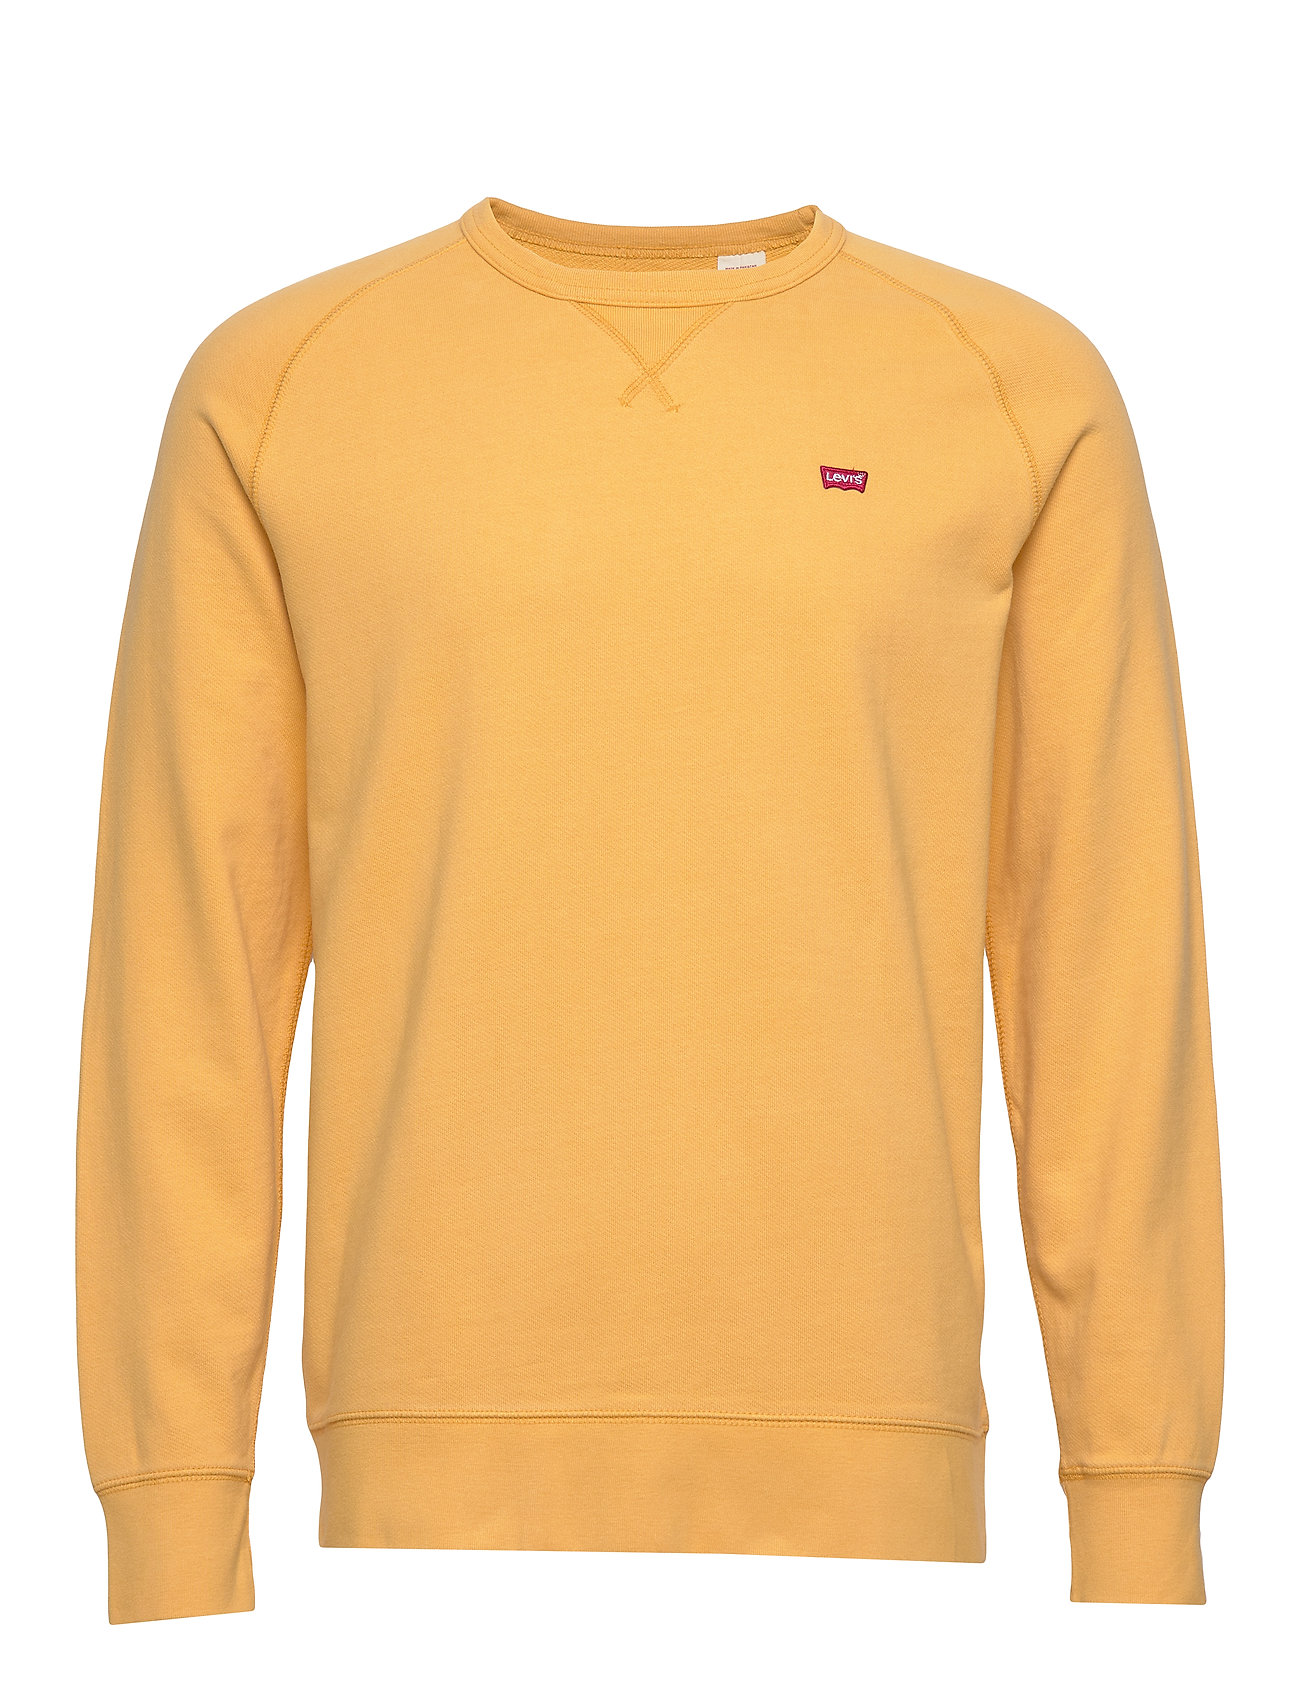 Image of Original Hm Icon Crew Golden A Sweatshirt Trøje Gul LEVI´S Men (3326810711)